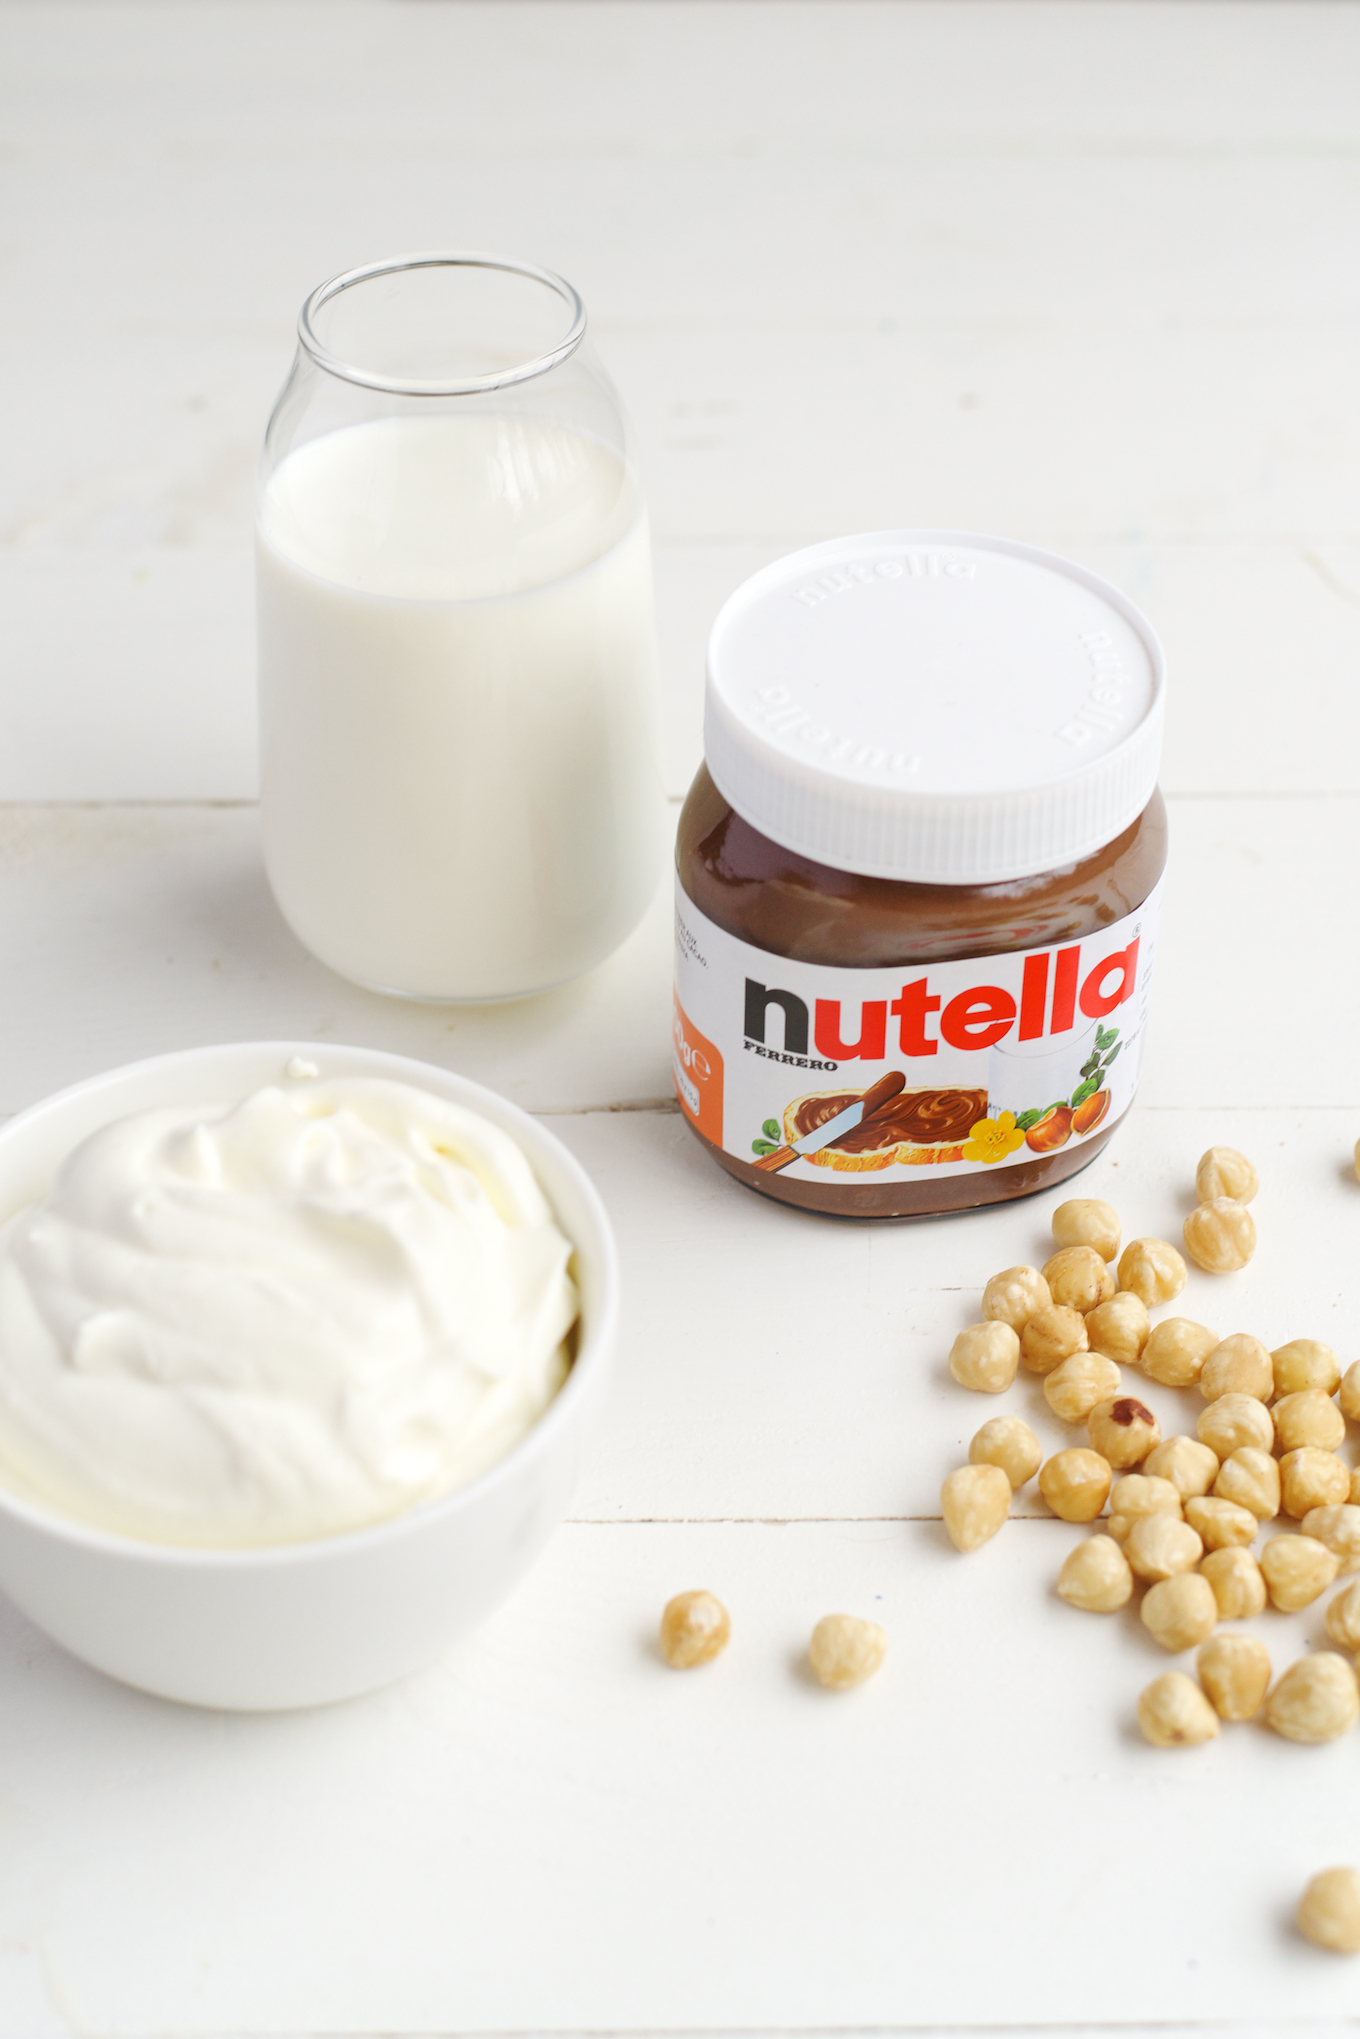 nutelle warme chocolade melk1